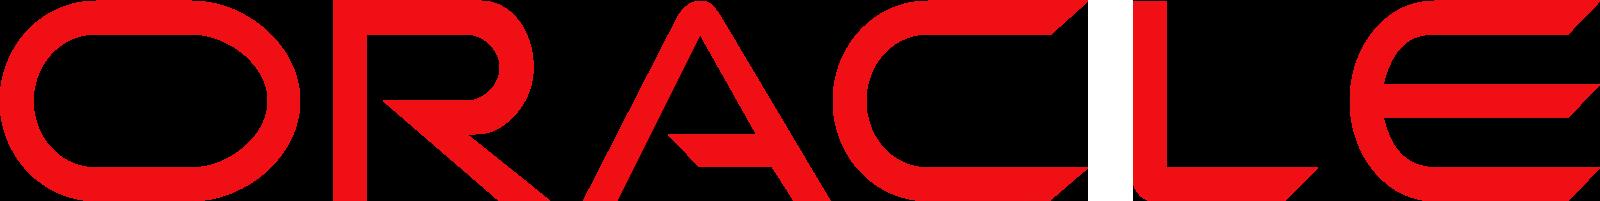 oracle_logo1600.png